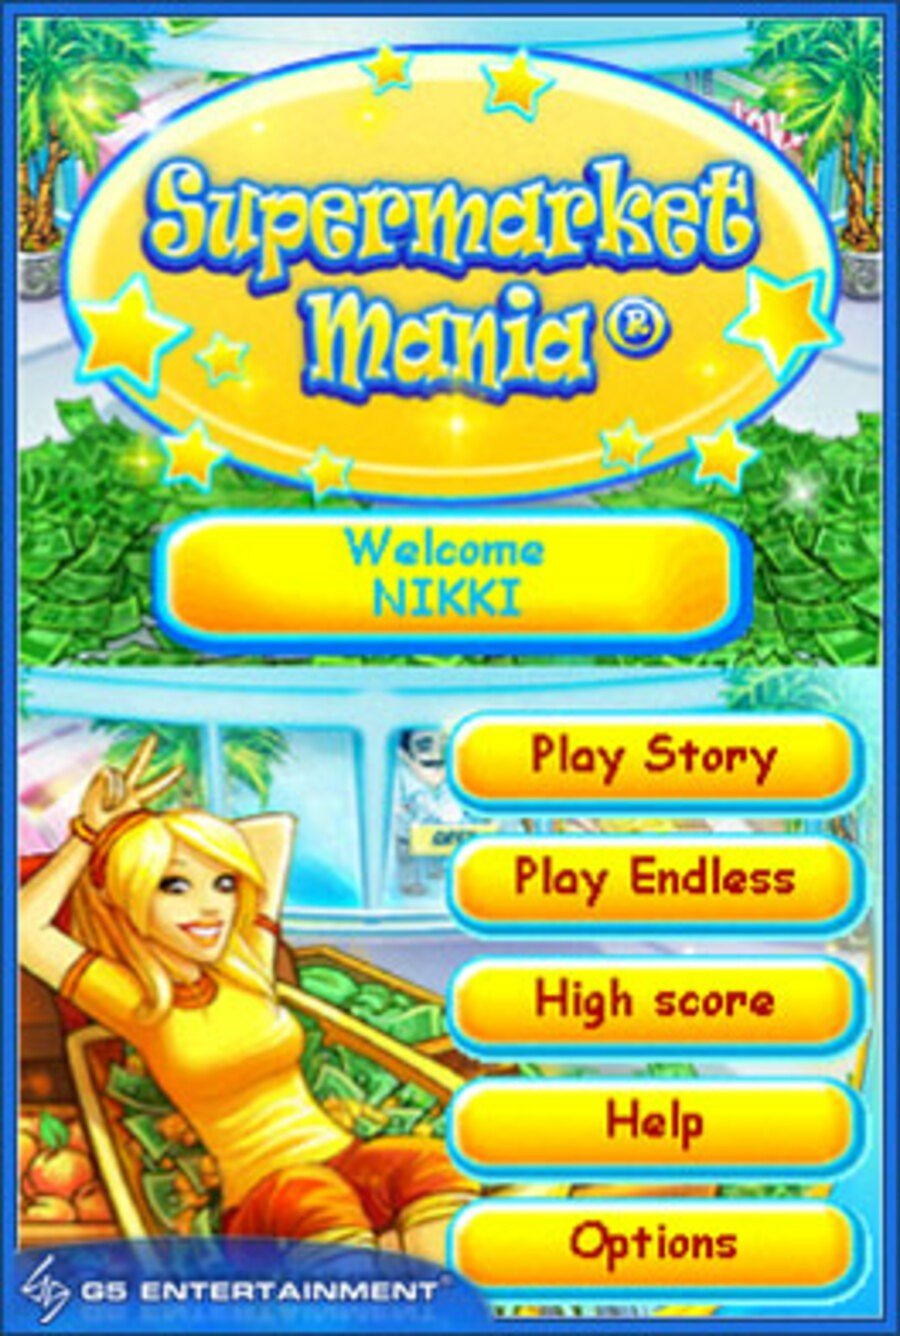 Supermarket Mania Screenshot